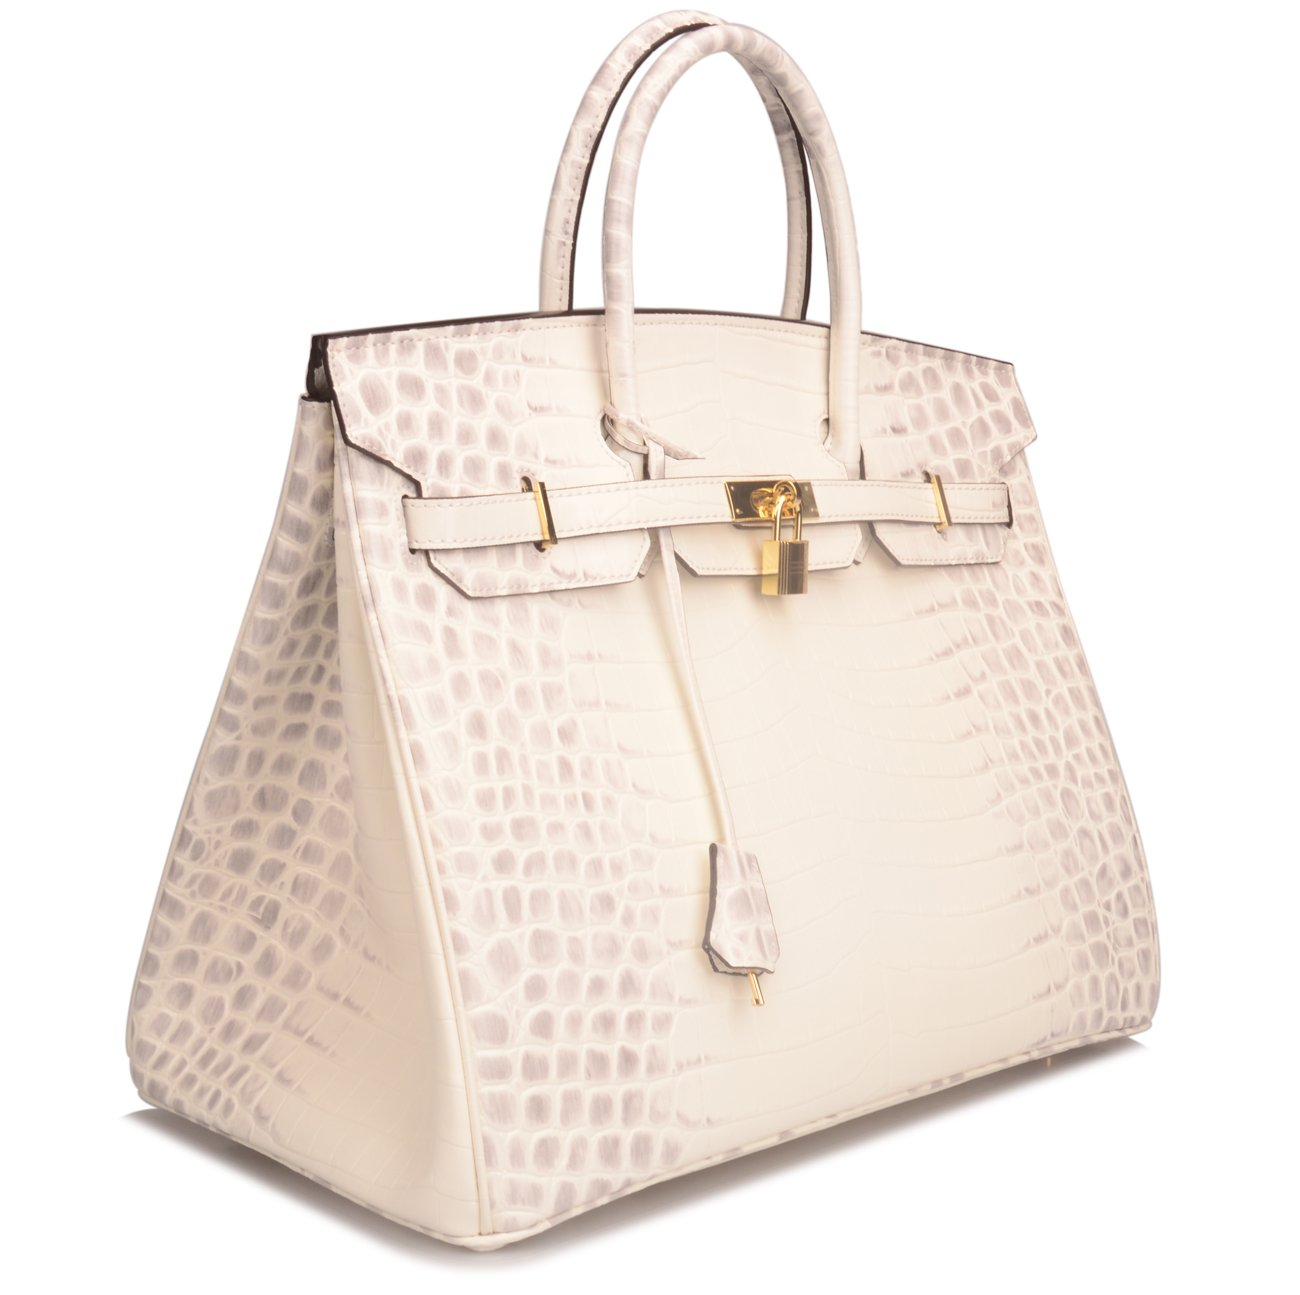 Ainifeel 40cm Oversized Patent Leather Padlock Handbag Business Purse (40cm OVERSIZE, Himalayan) by Ainifeel (Image #3)